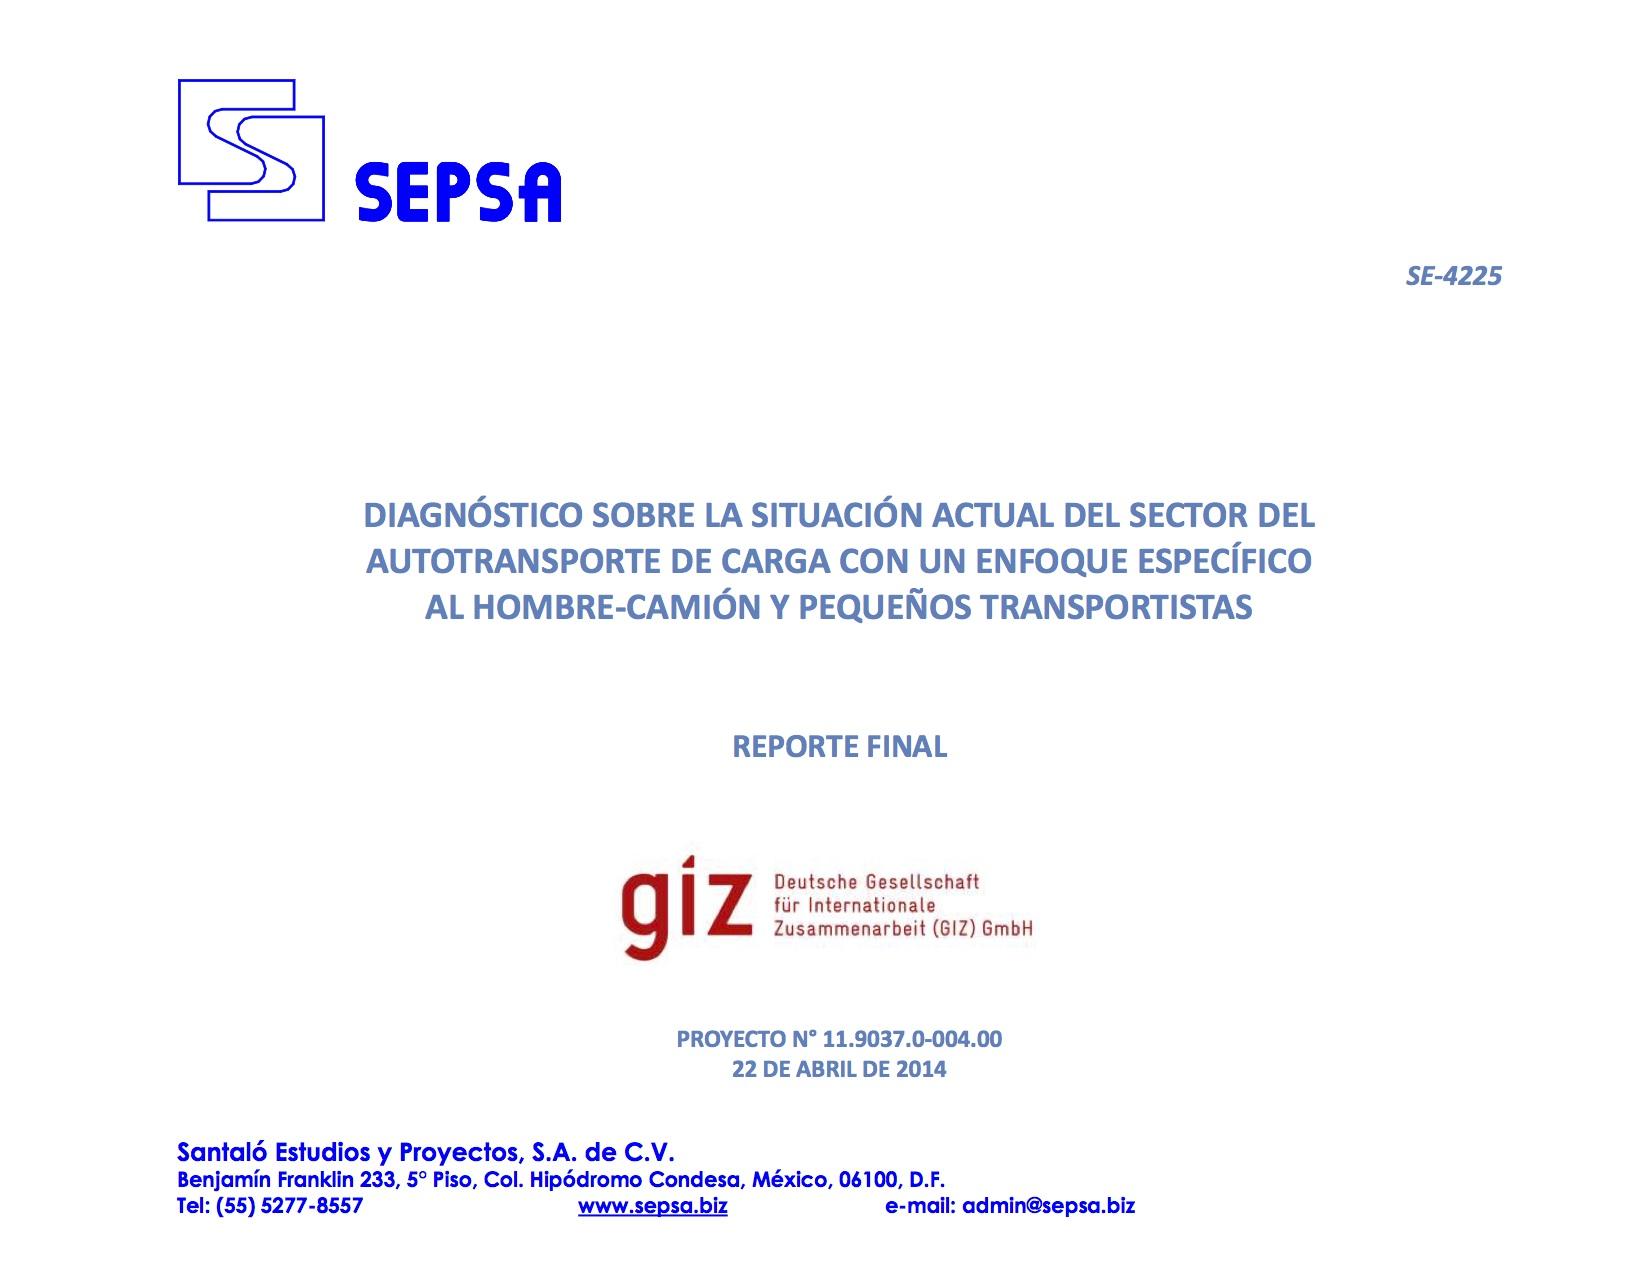 Reporte Final GIZ Radiografia mayo 2014